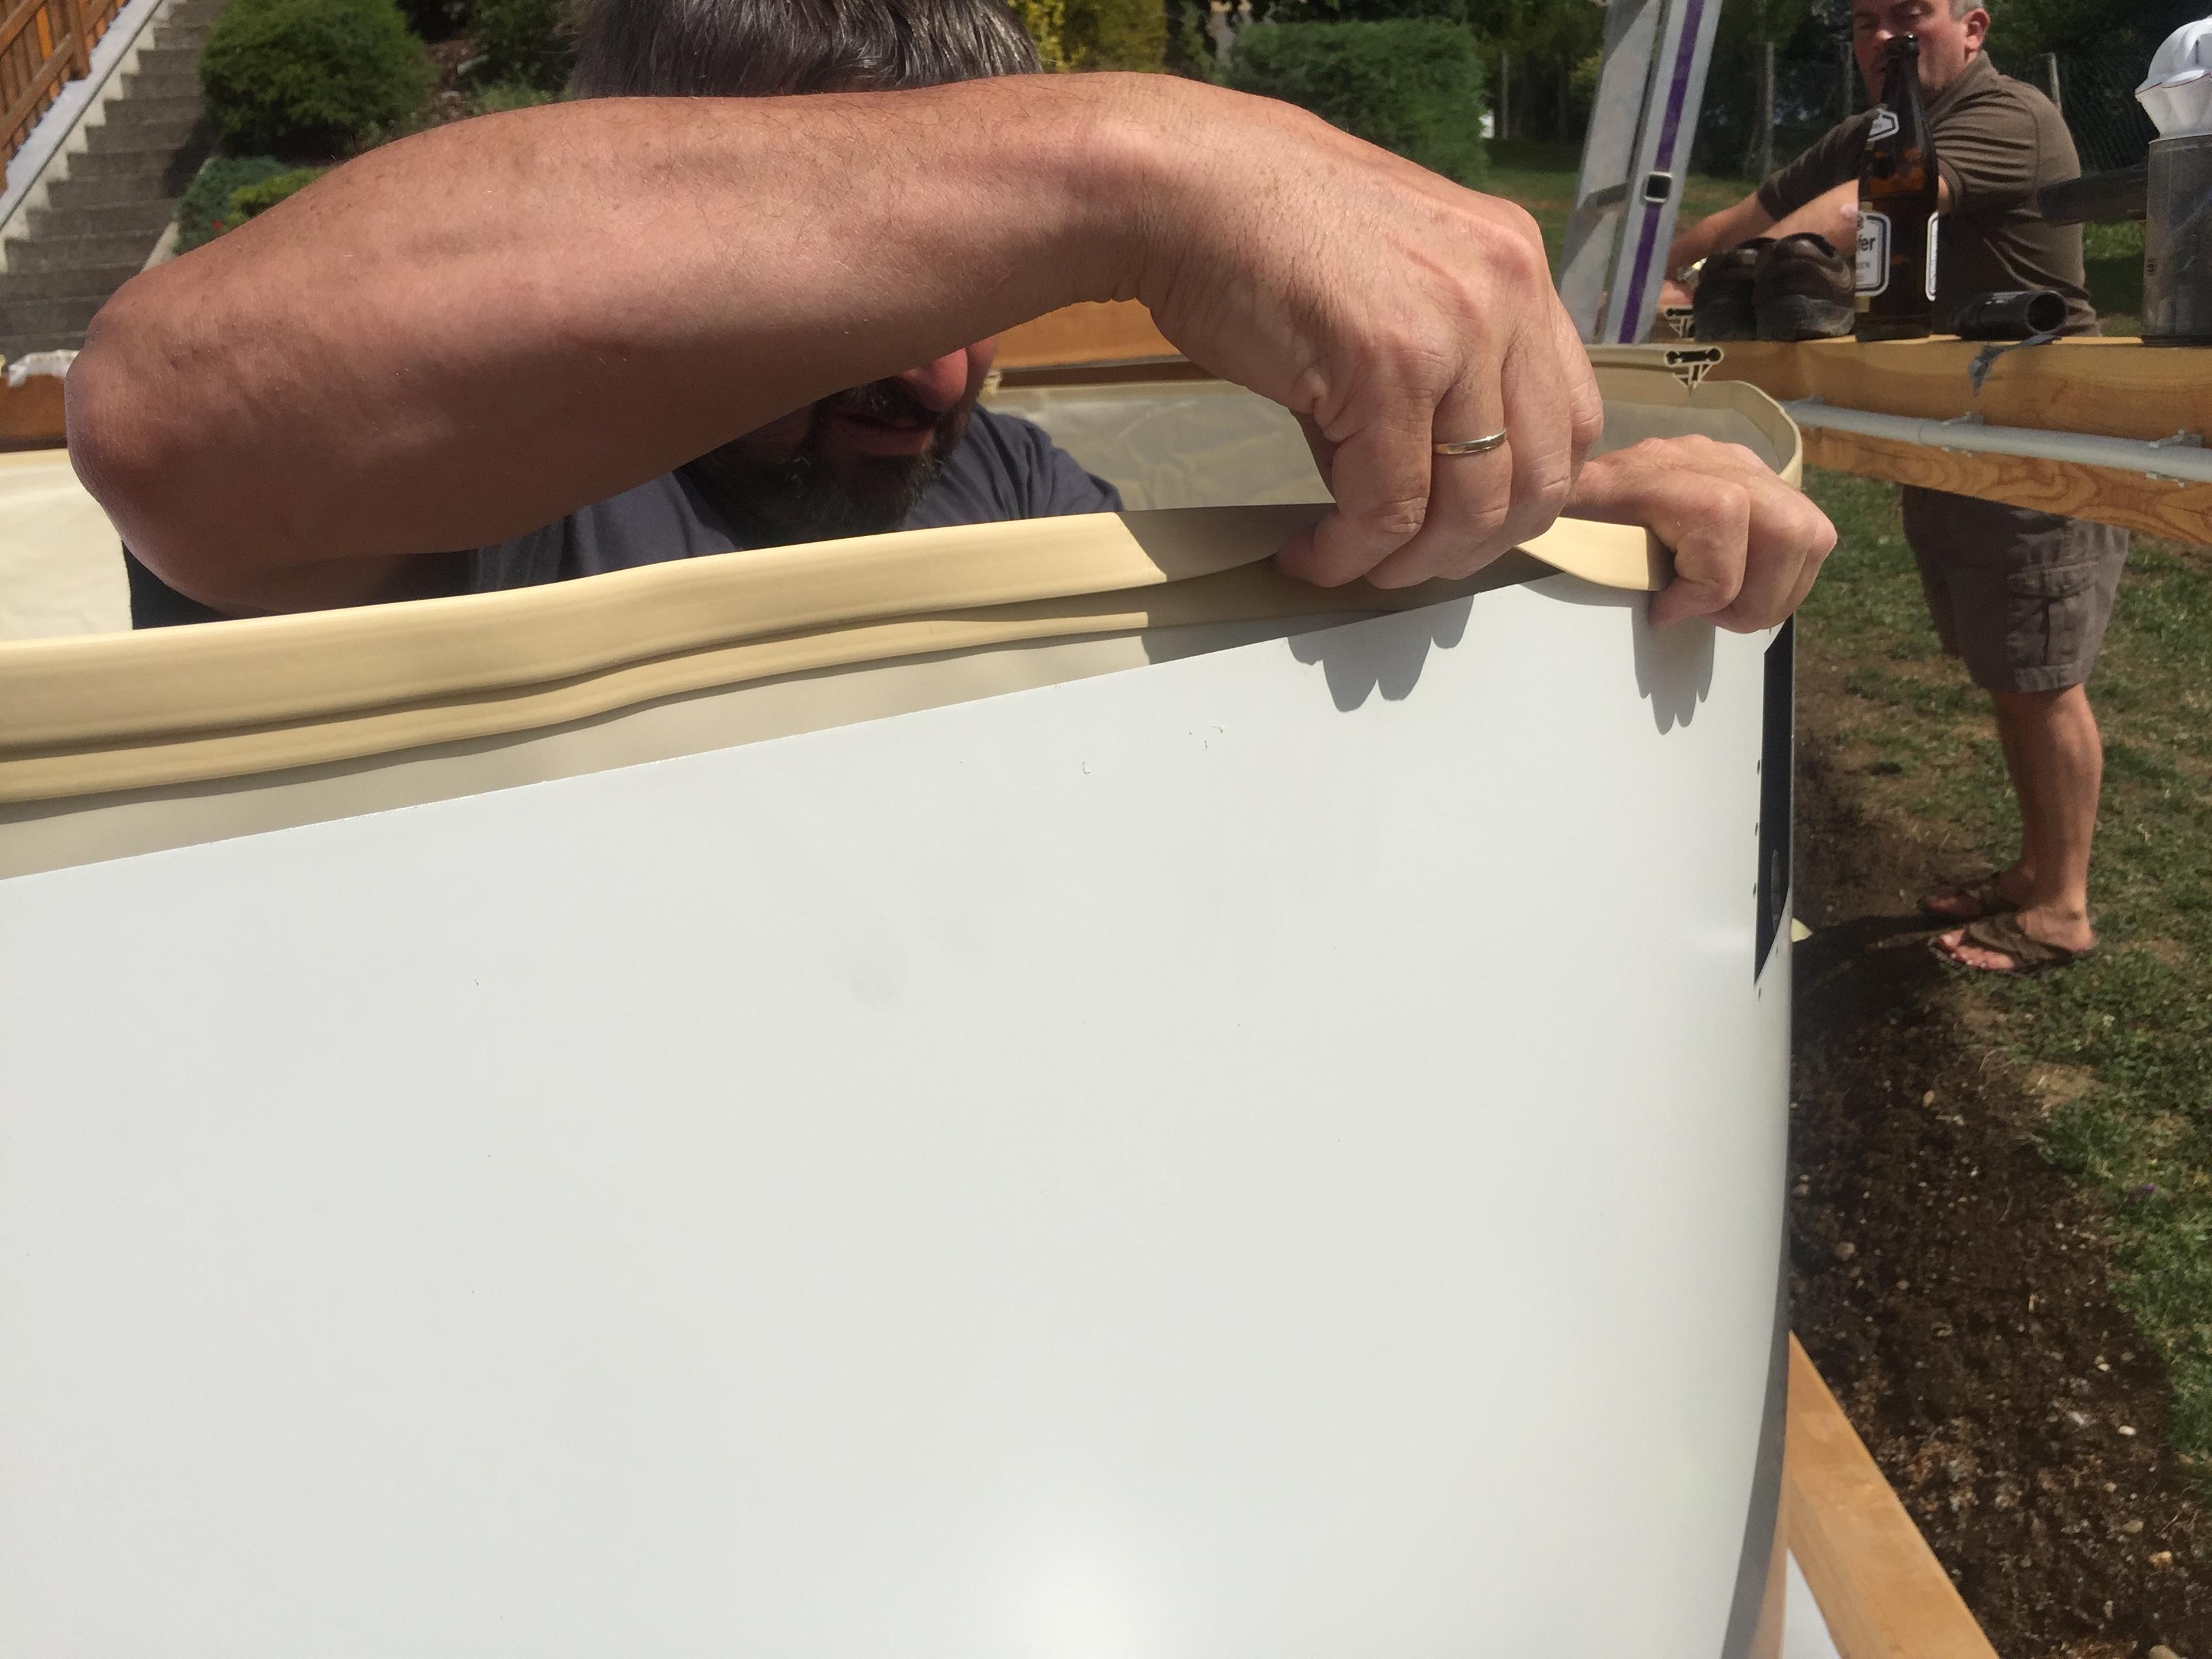 Rundpool prime 450 x 135 cm komplettset apoolco for Poolfolie montieren